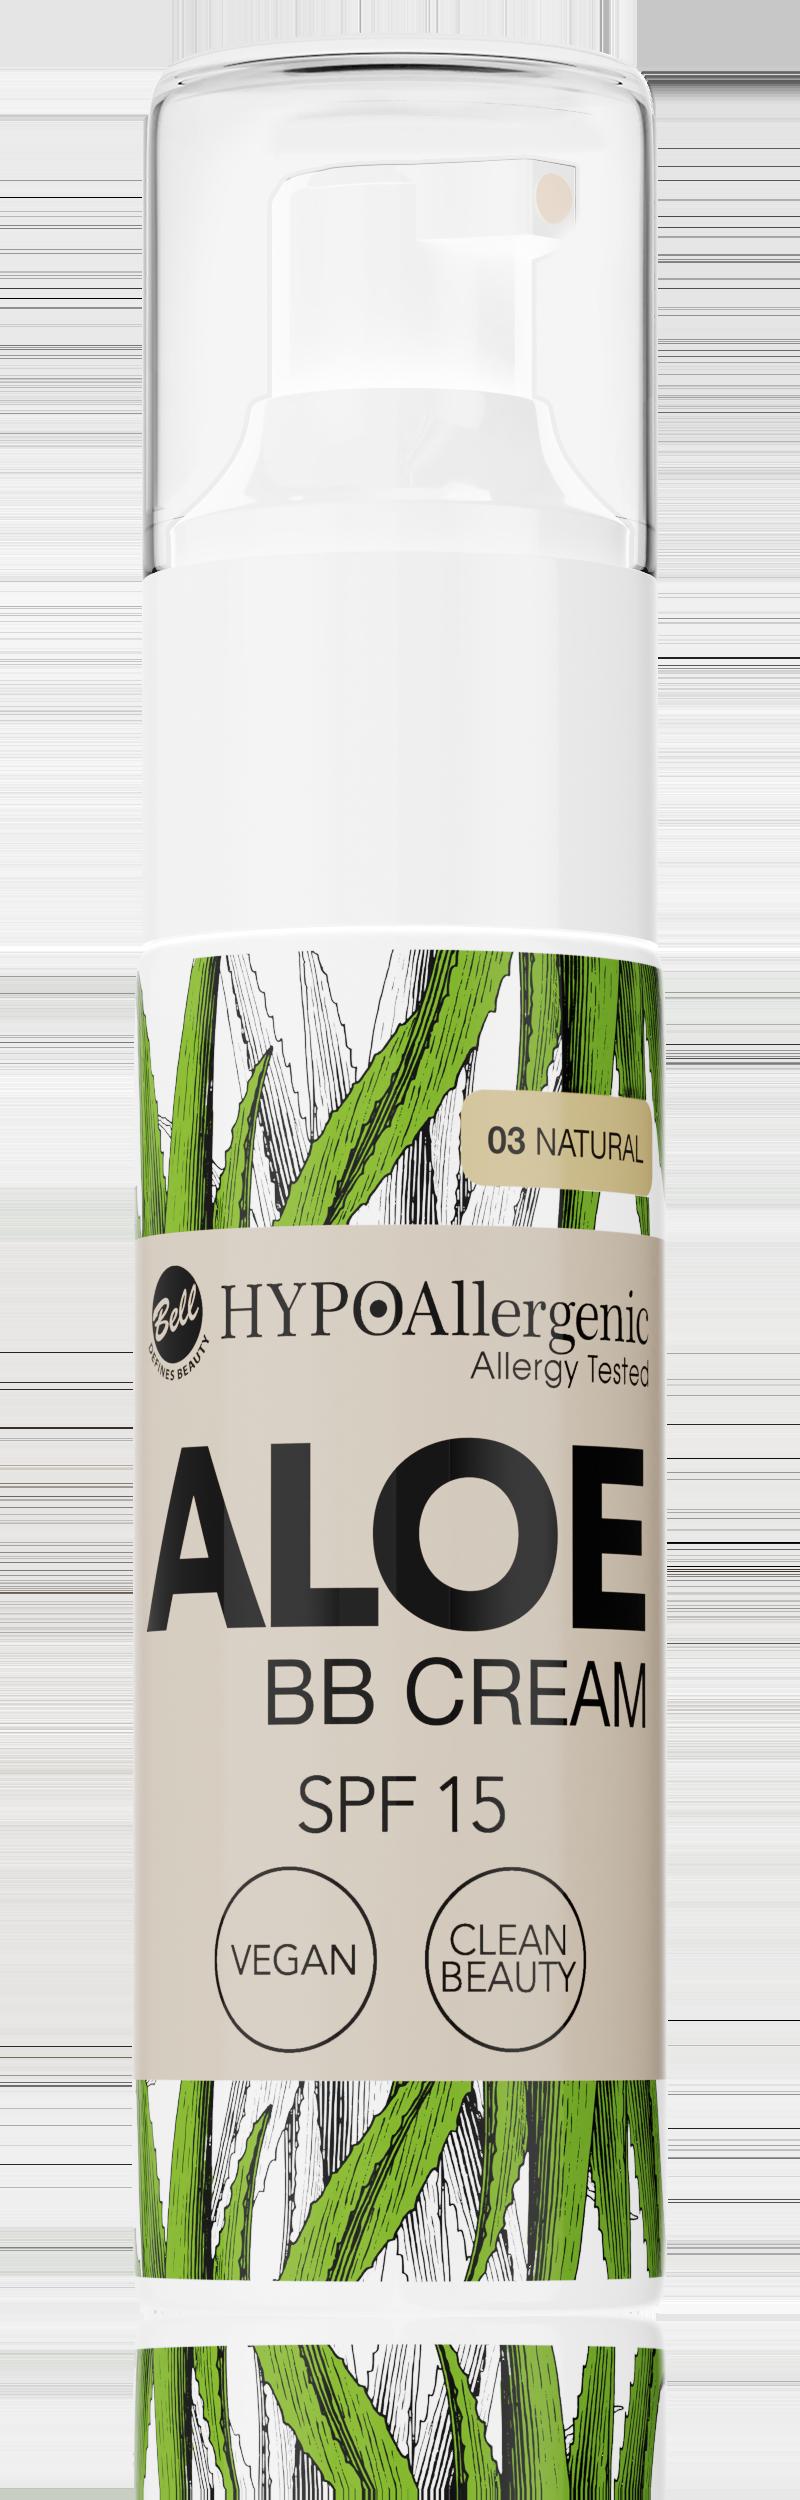 HYPOAllergenic Aloe BB Cream SPF 15